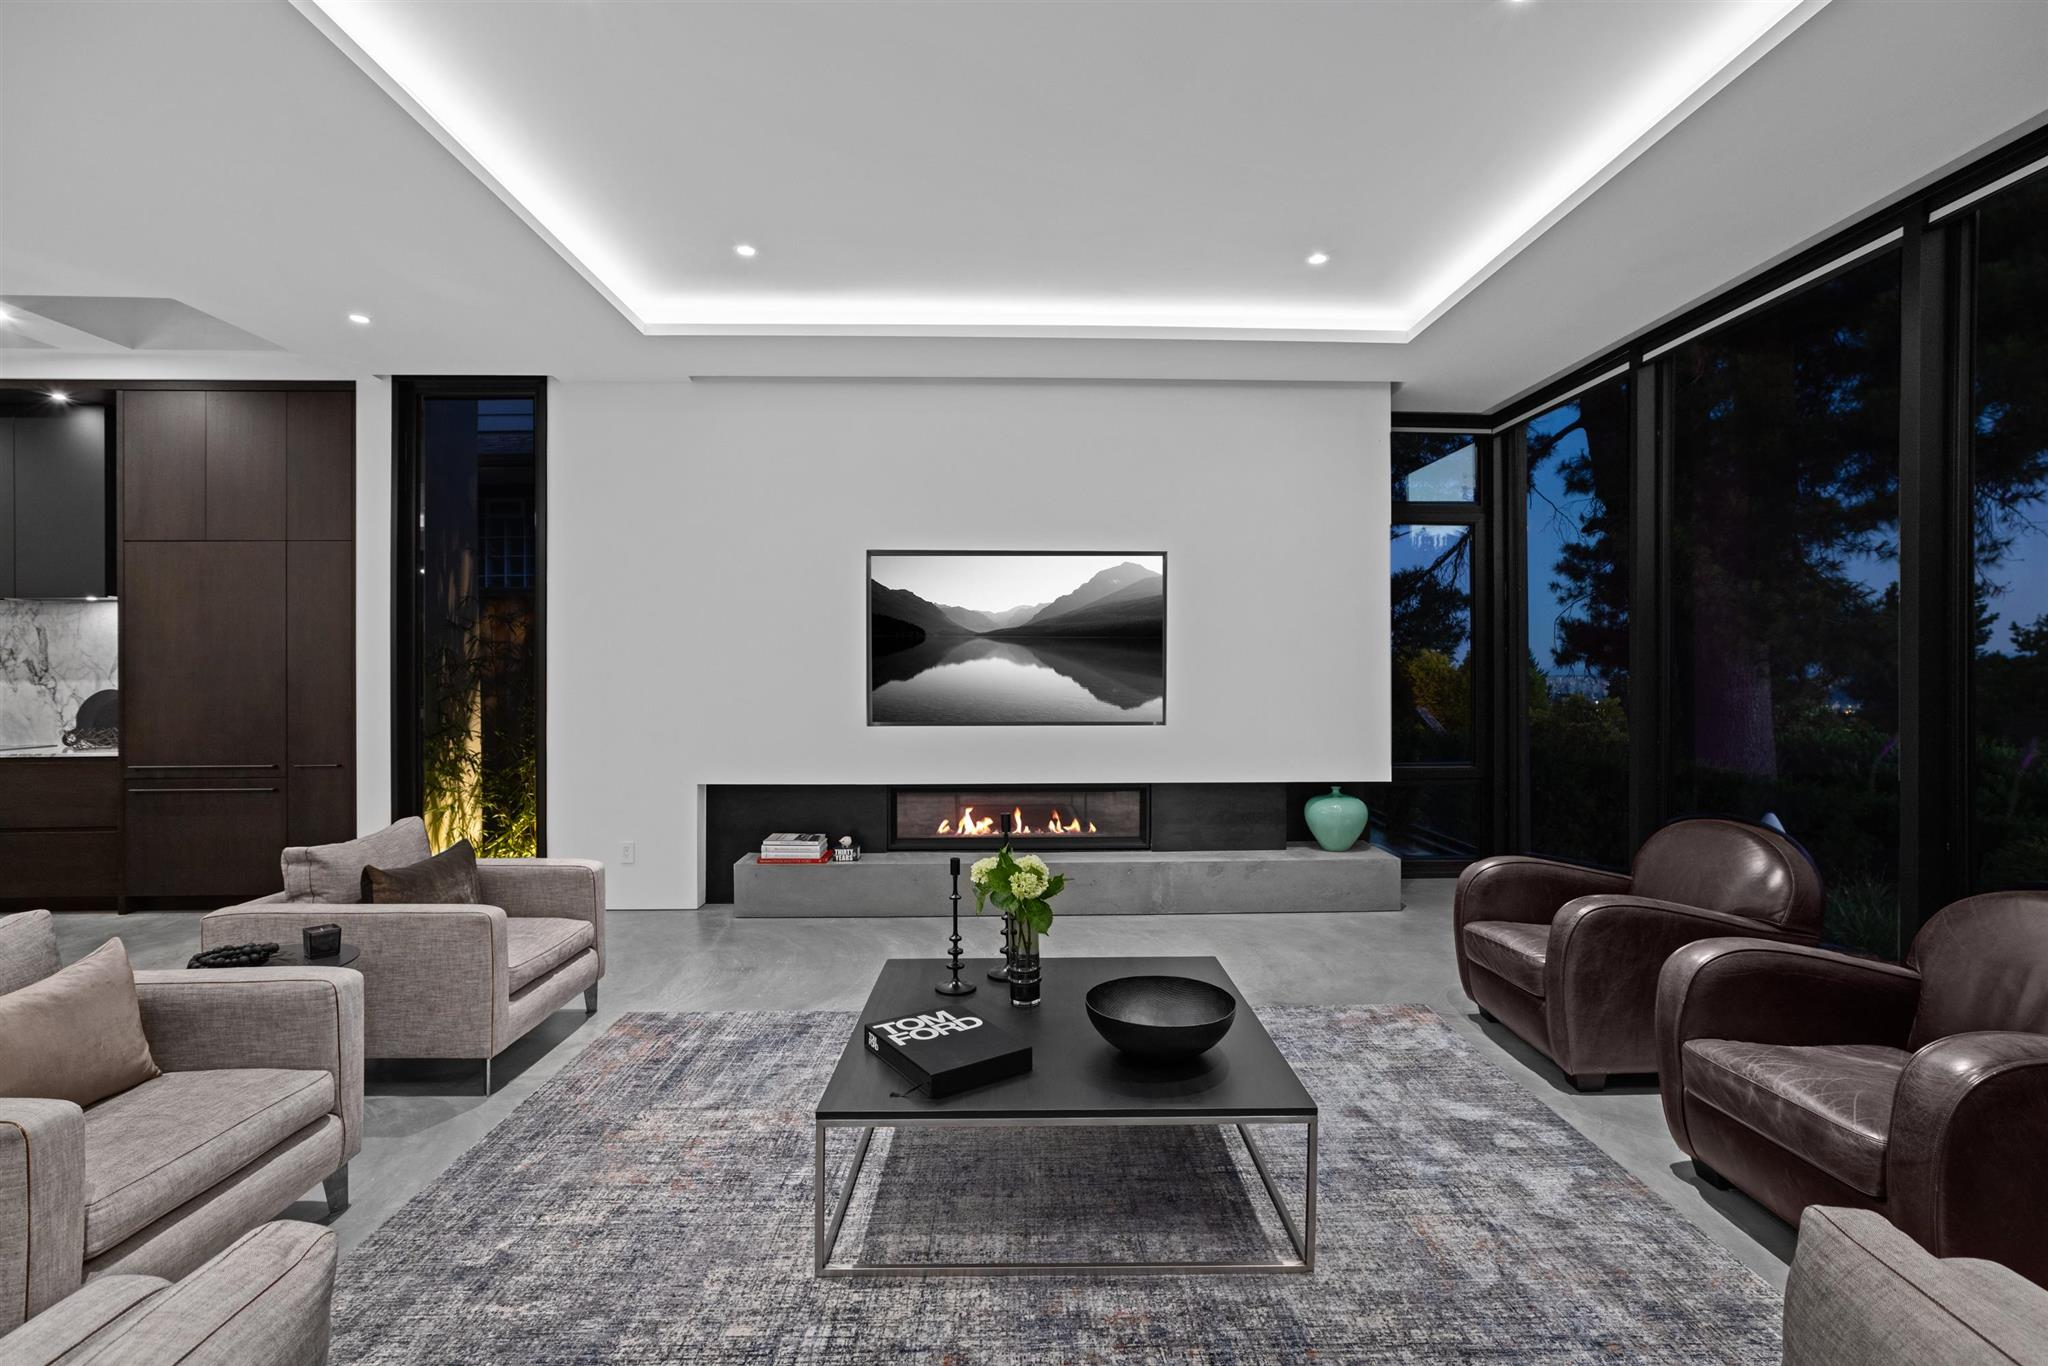 276 SANDRINGHAM CRESCENT - Upper Lonsdale House/Single Family for sale, 7 Bedrooms (R2617703) - #7